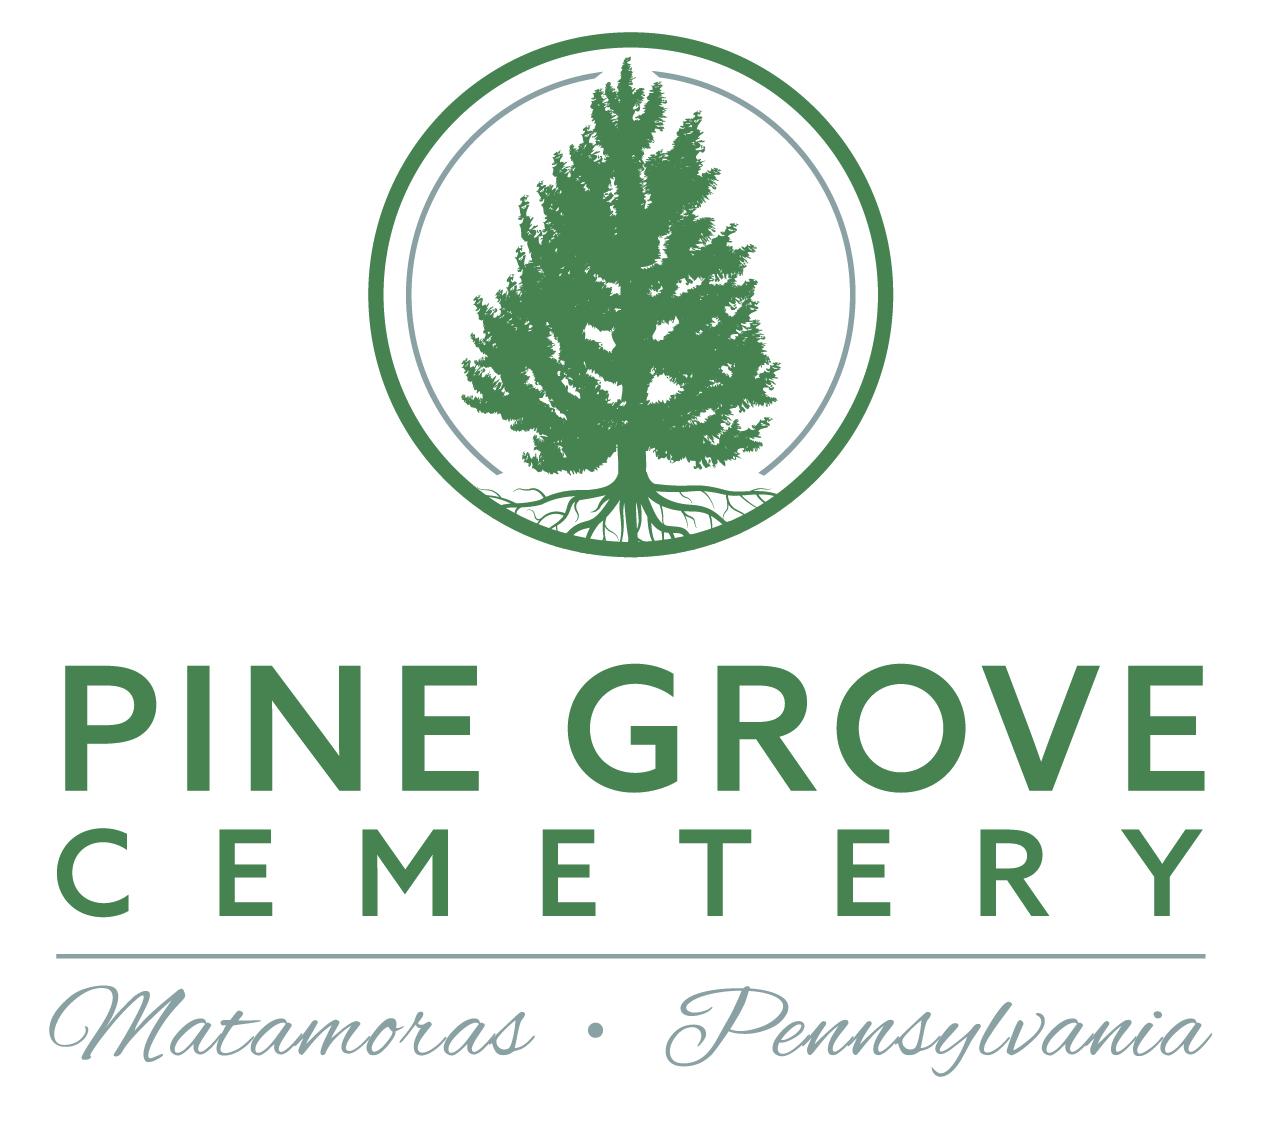 https://secureservercdn.net/198.71.233.28/19x.387.myftpupload.com/wp-content/uploads/2020/07/PineGrove-Logo-stacked.jpg